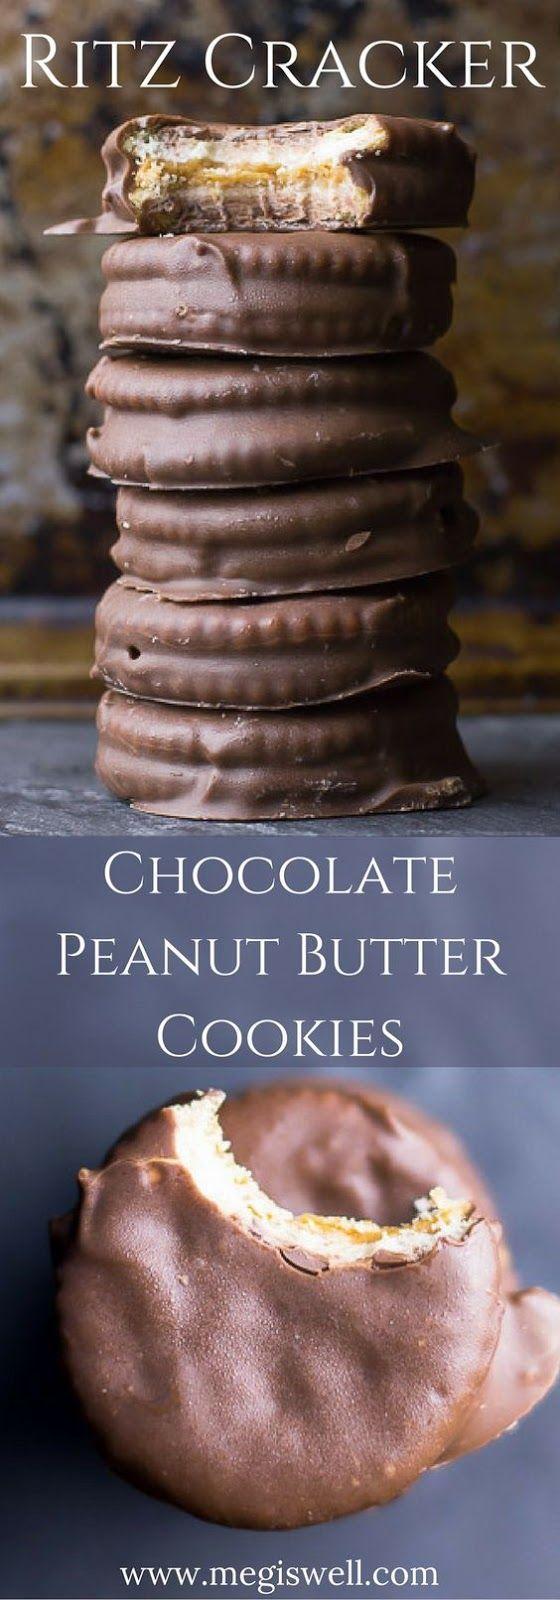 Chocolate, chocolate and chocolate cookies!